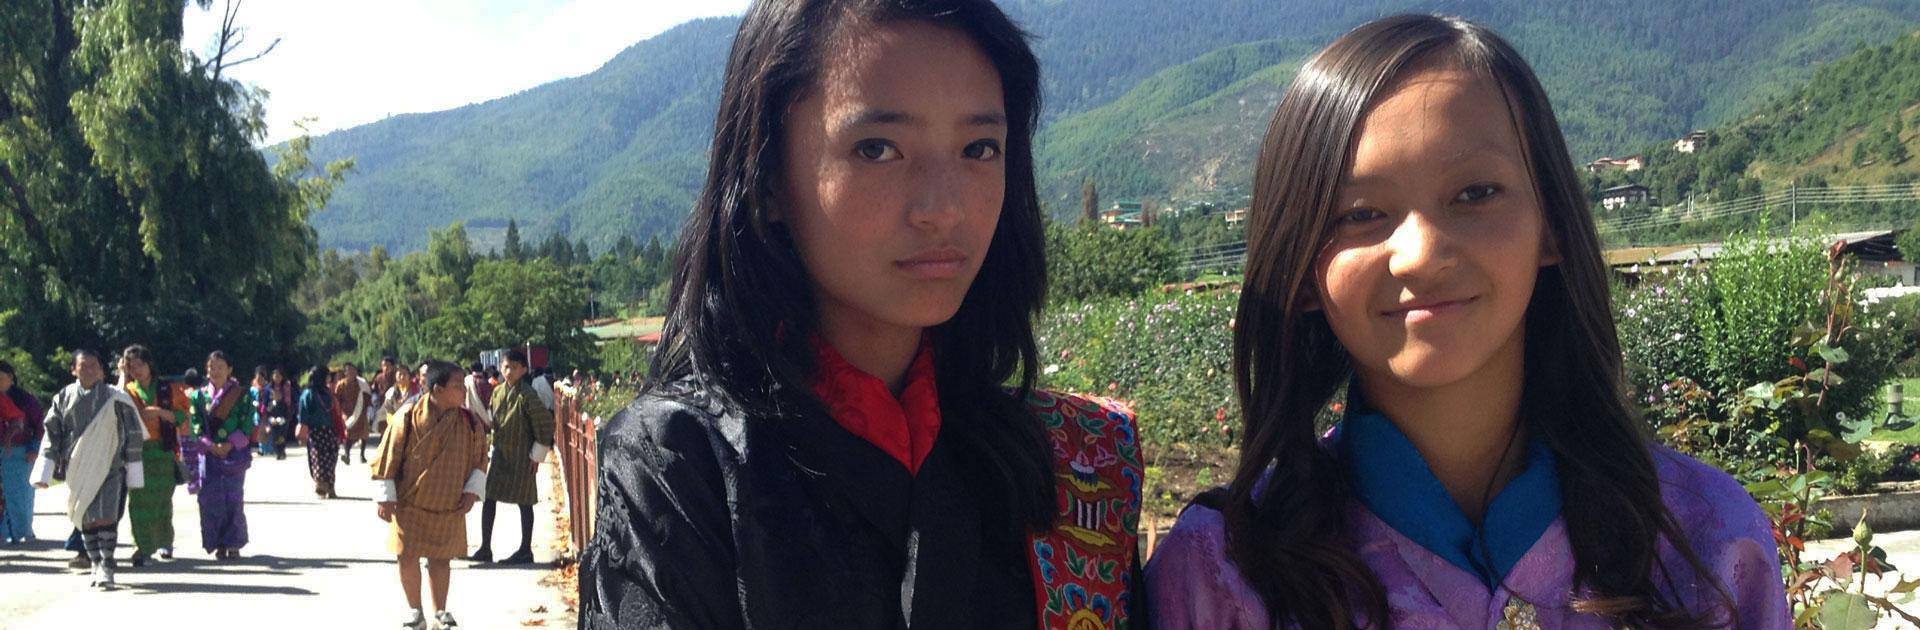 BT Bután al Completo 10 días 1 1